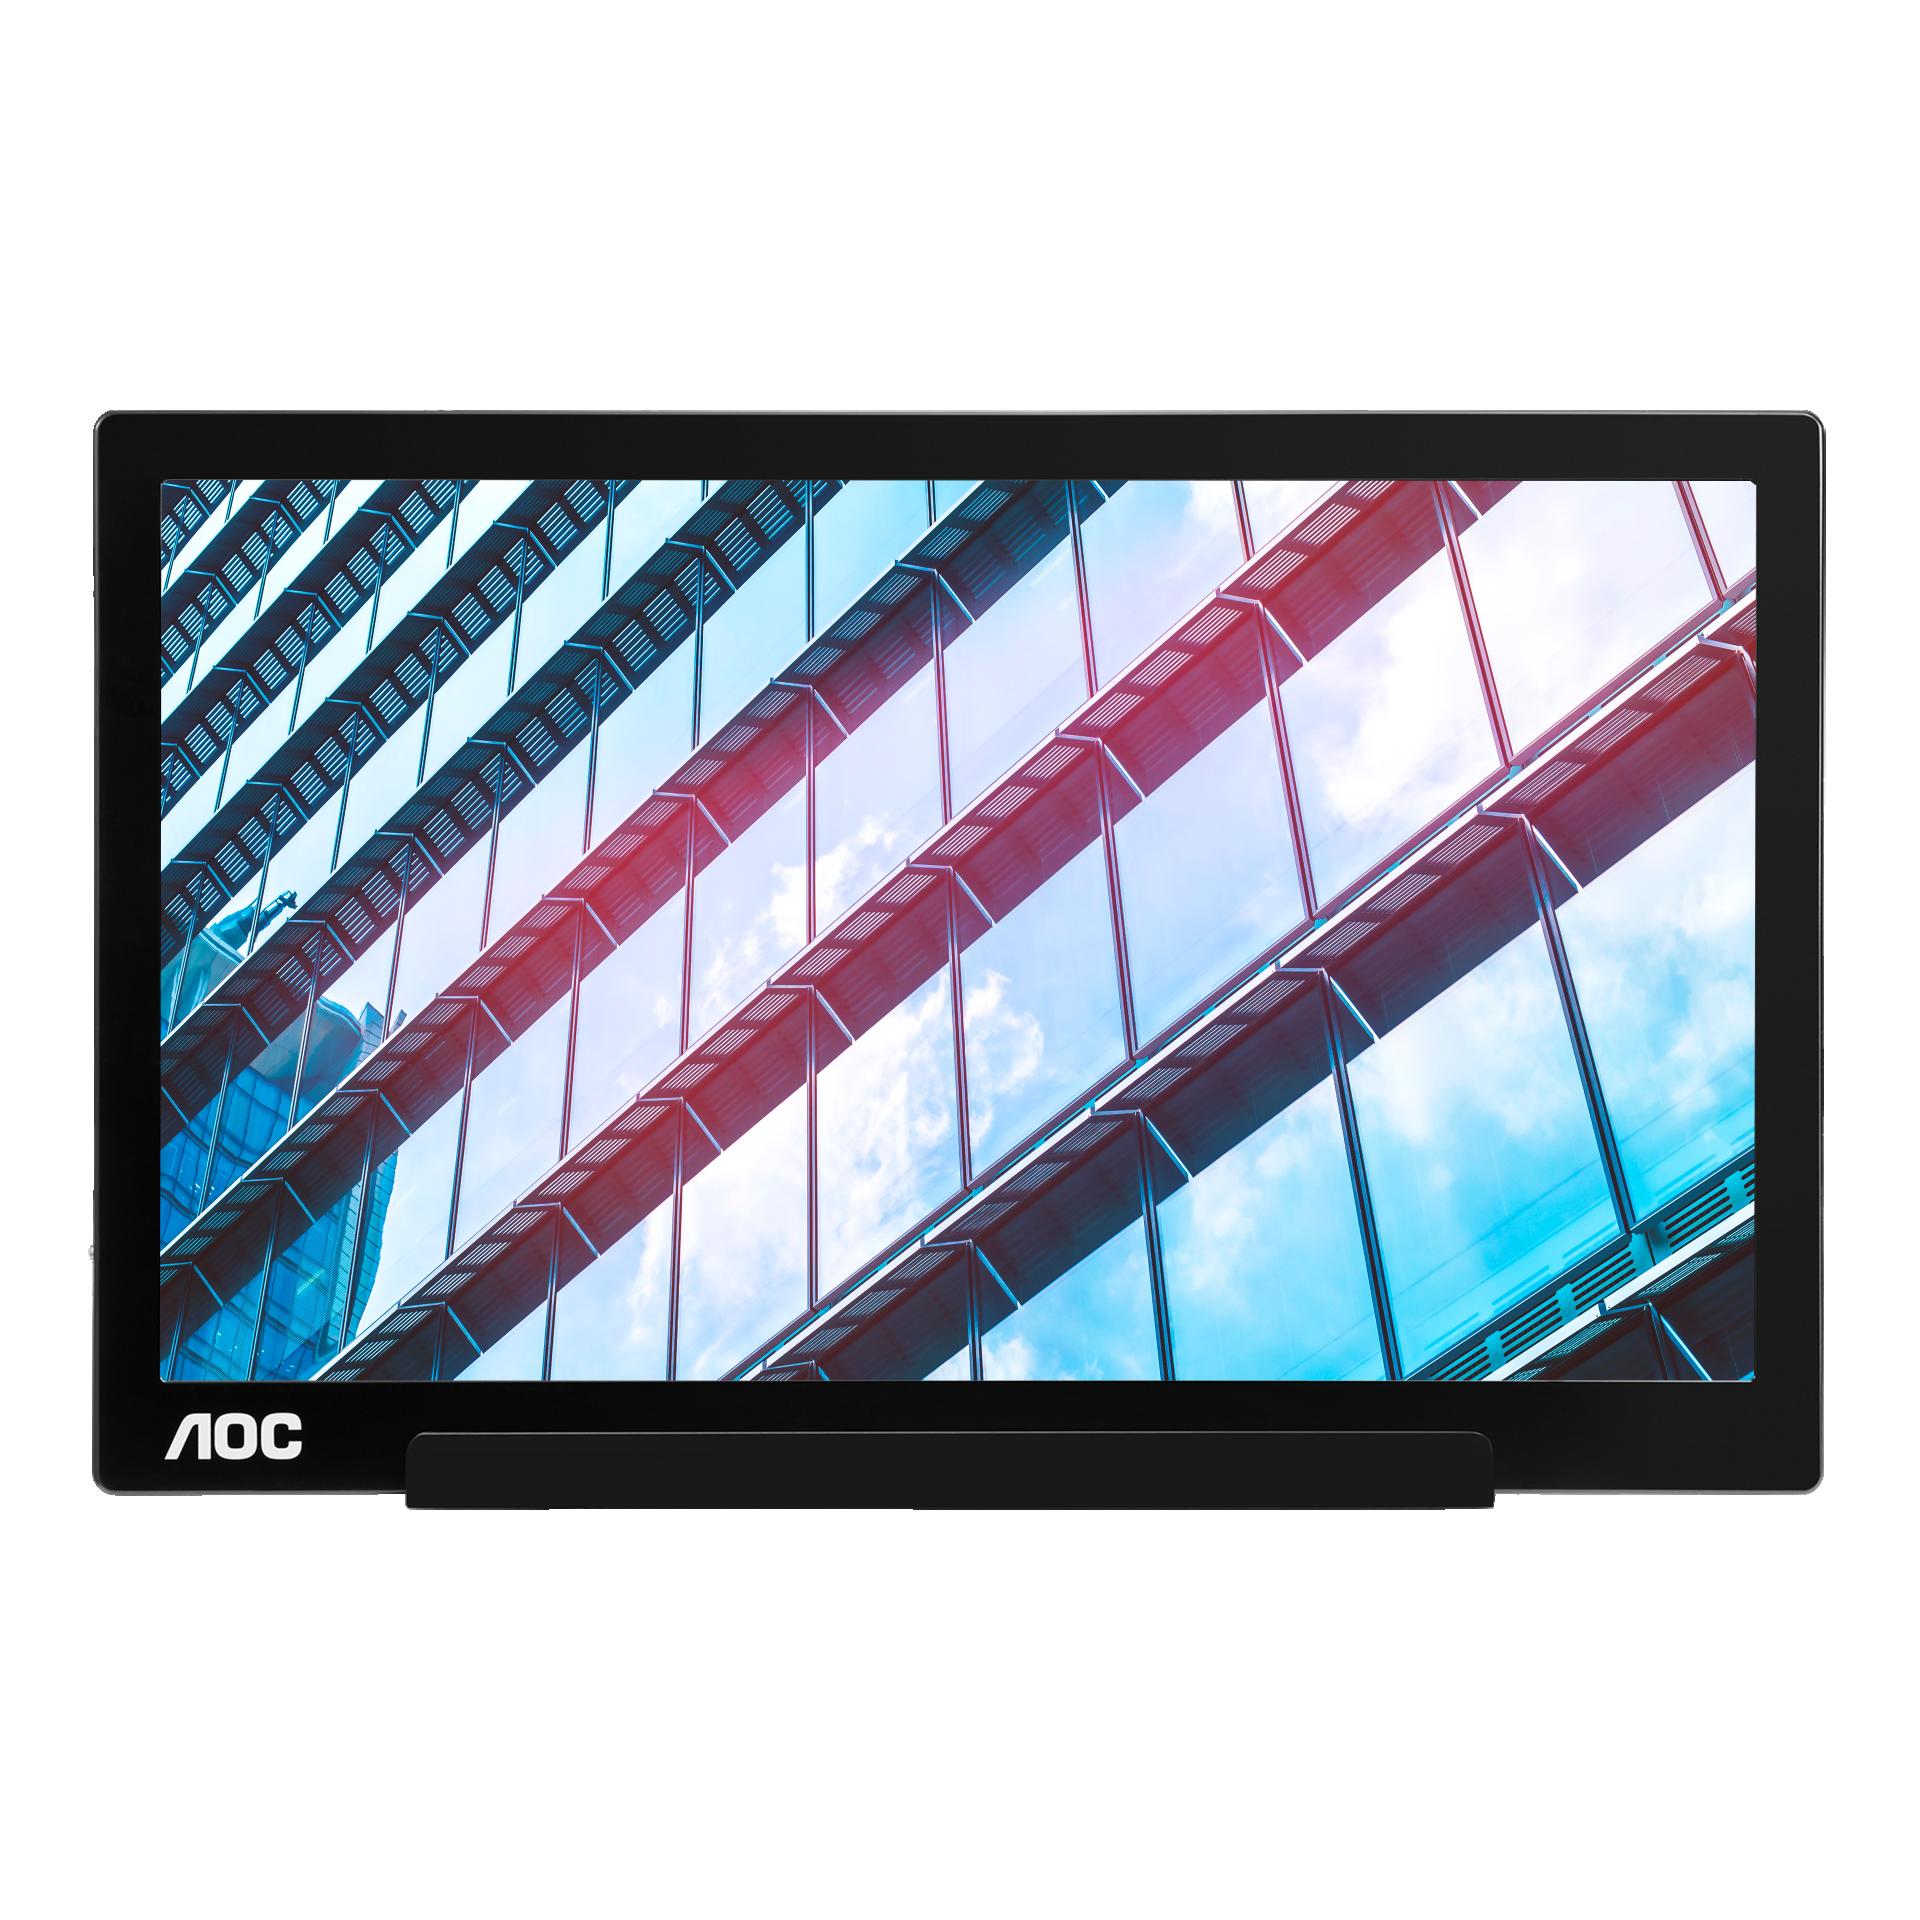 AOC_I1601P_PV_HERO_VISUAL_2.png